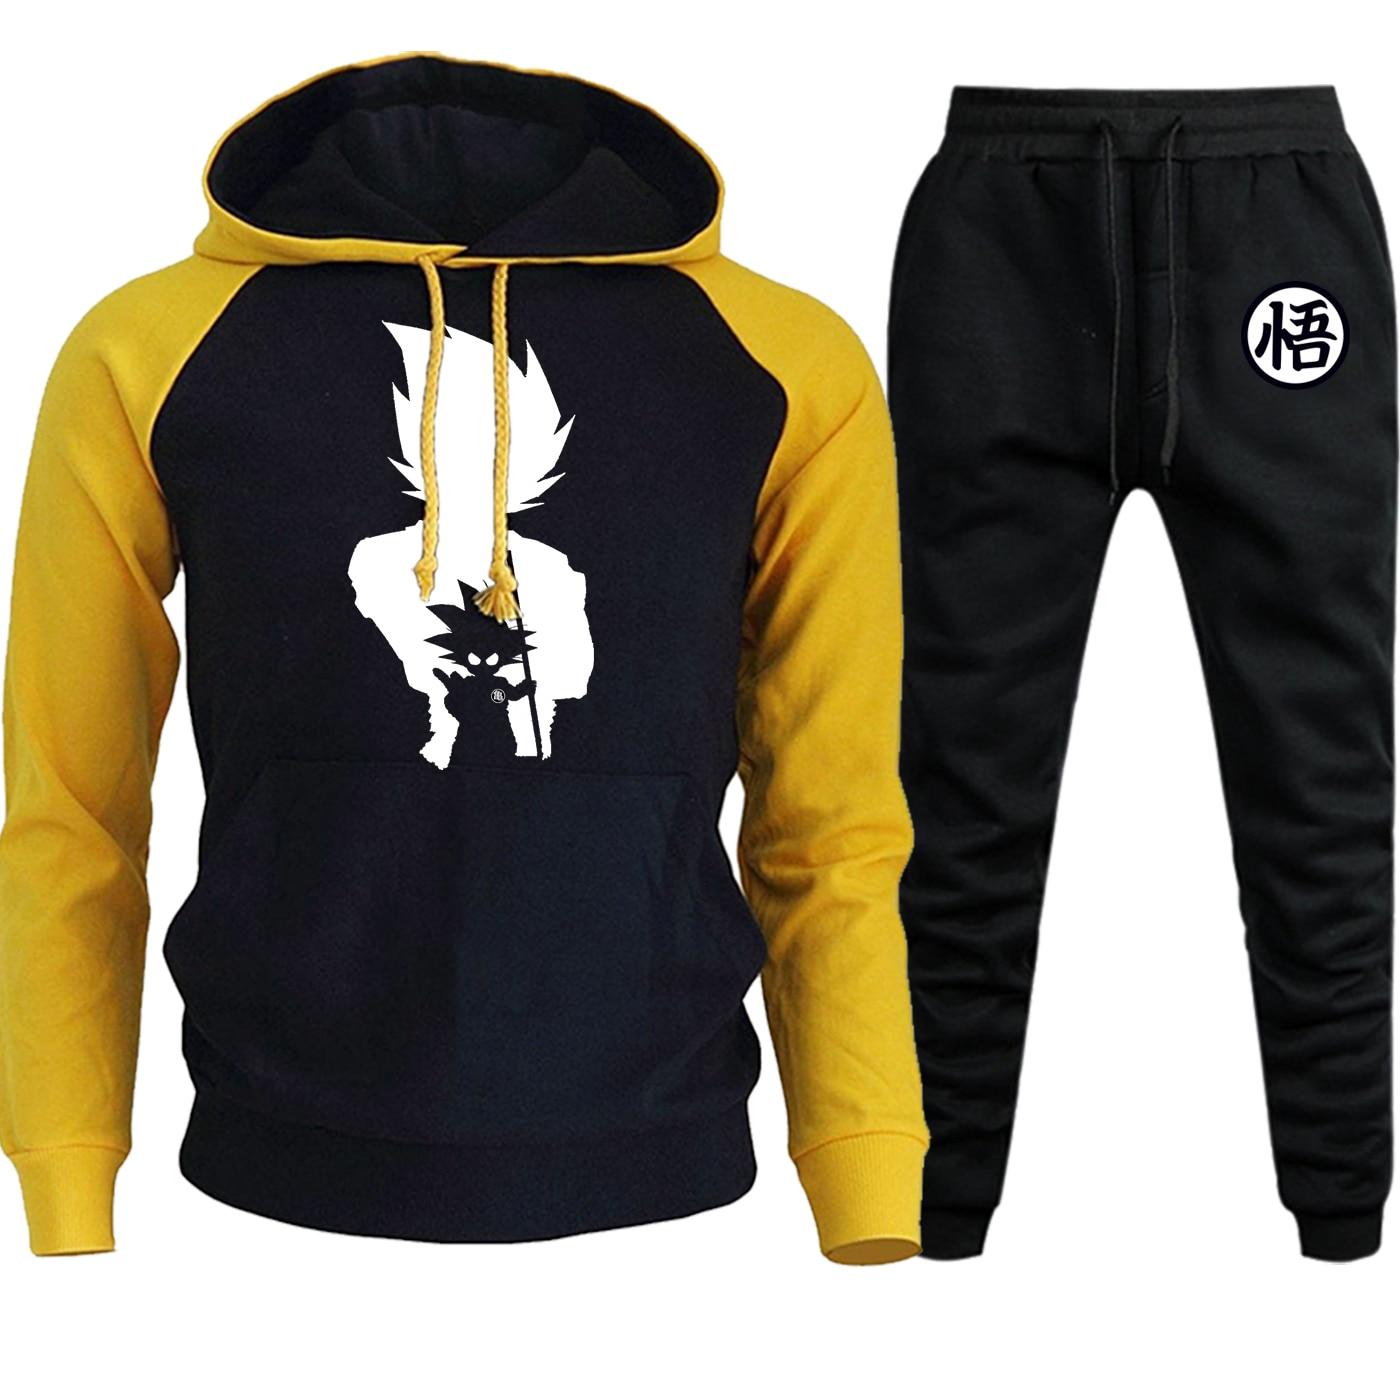 Dragon Ball New Autumn Winter Hooded Mens Raglan Sweatshirts Cartoon Print Suit Male Hoodie Casual Pullover+Pants 2 Piece Set